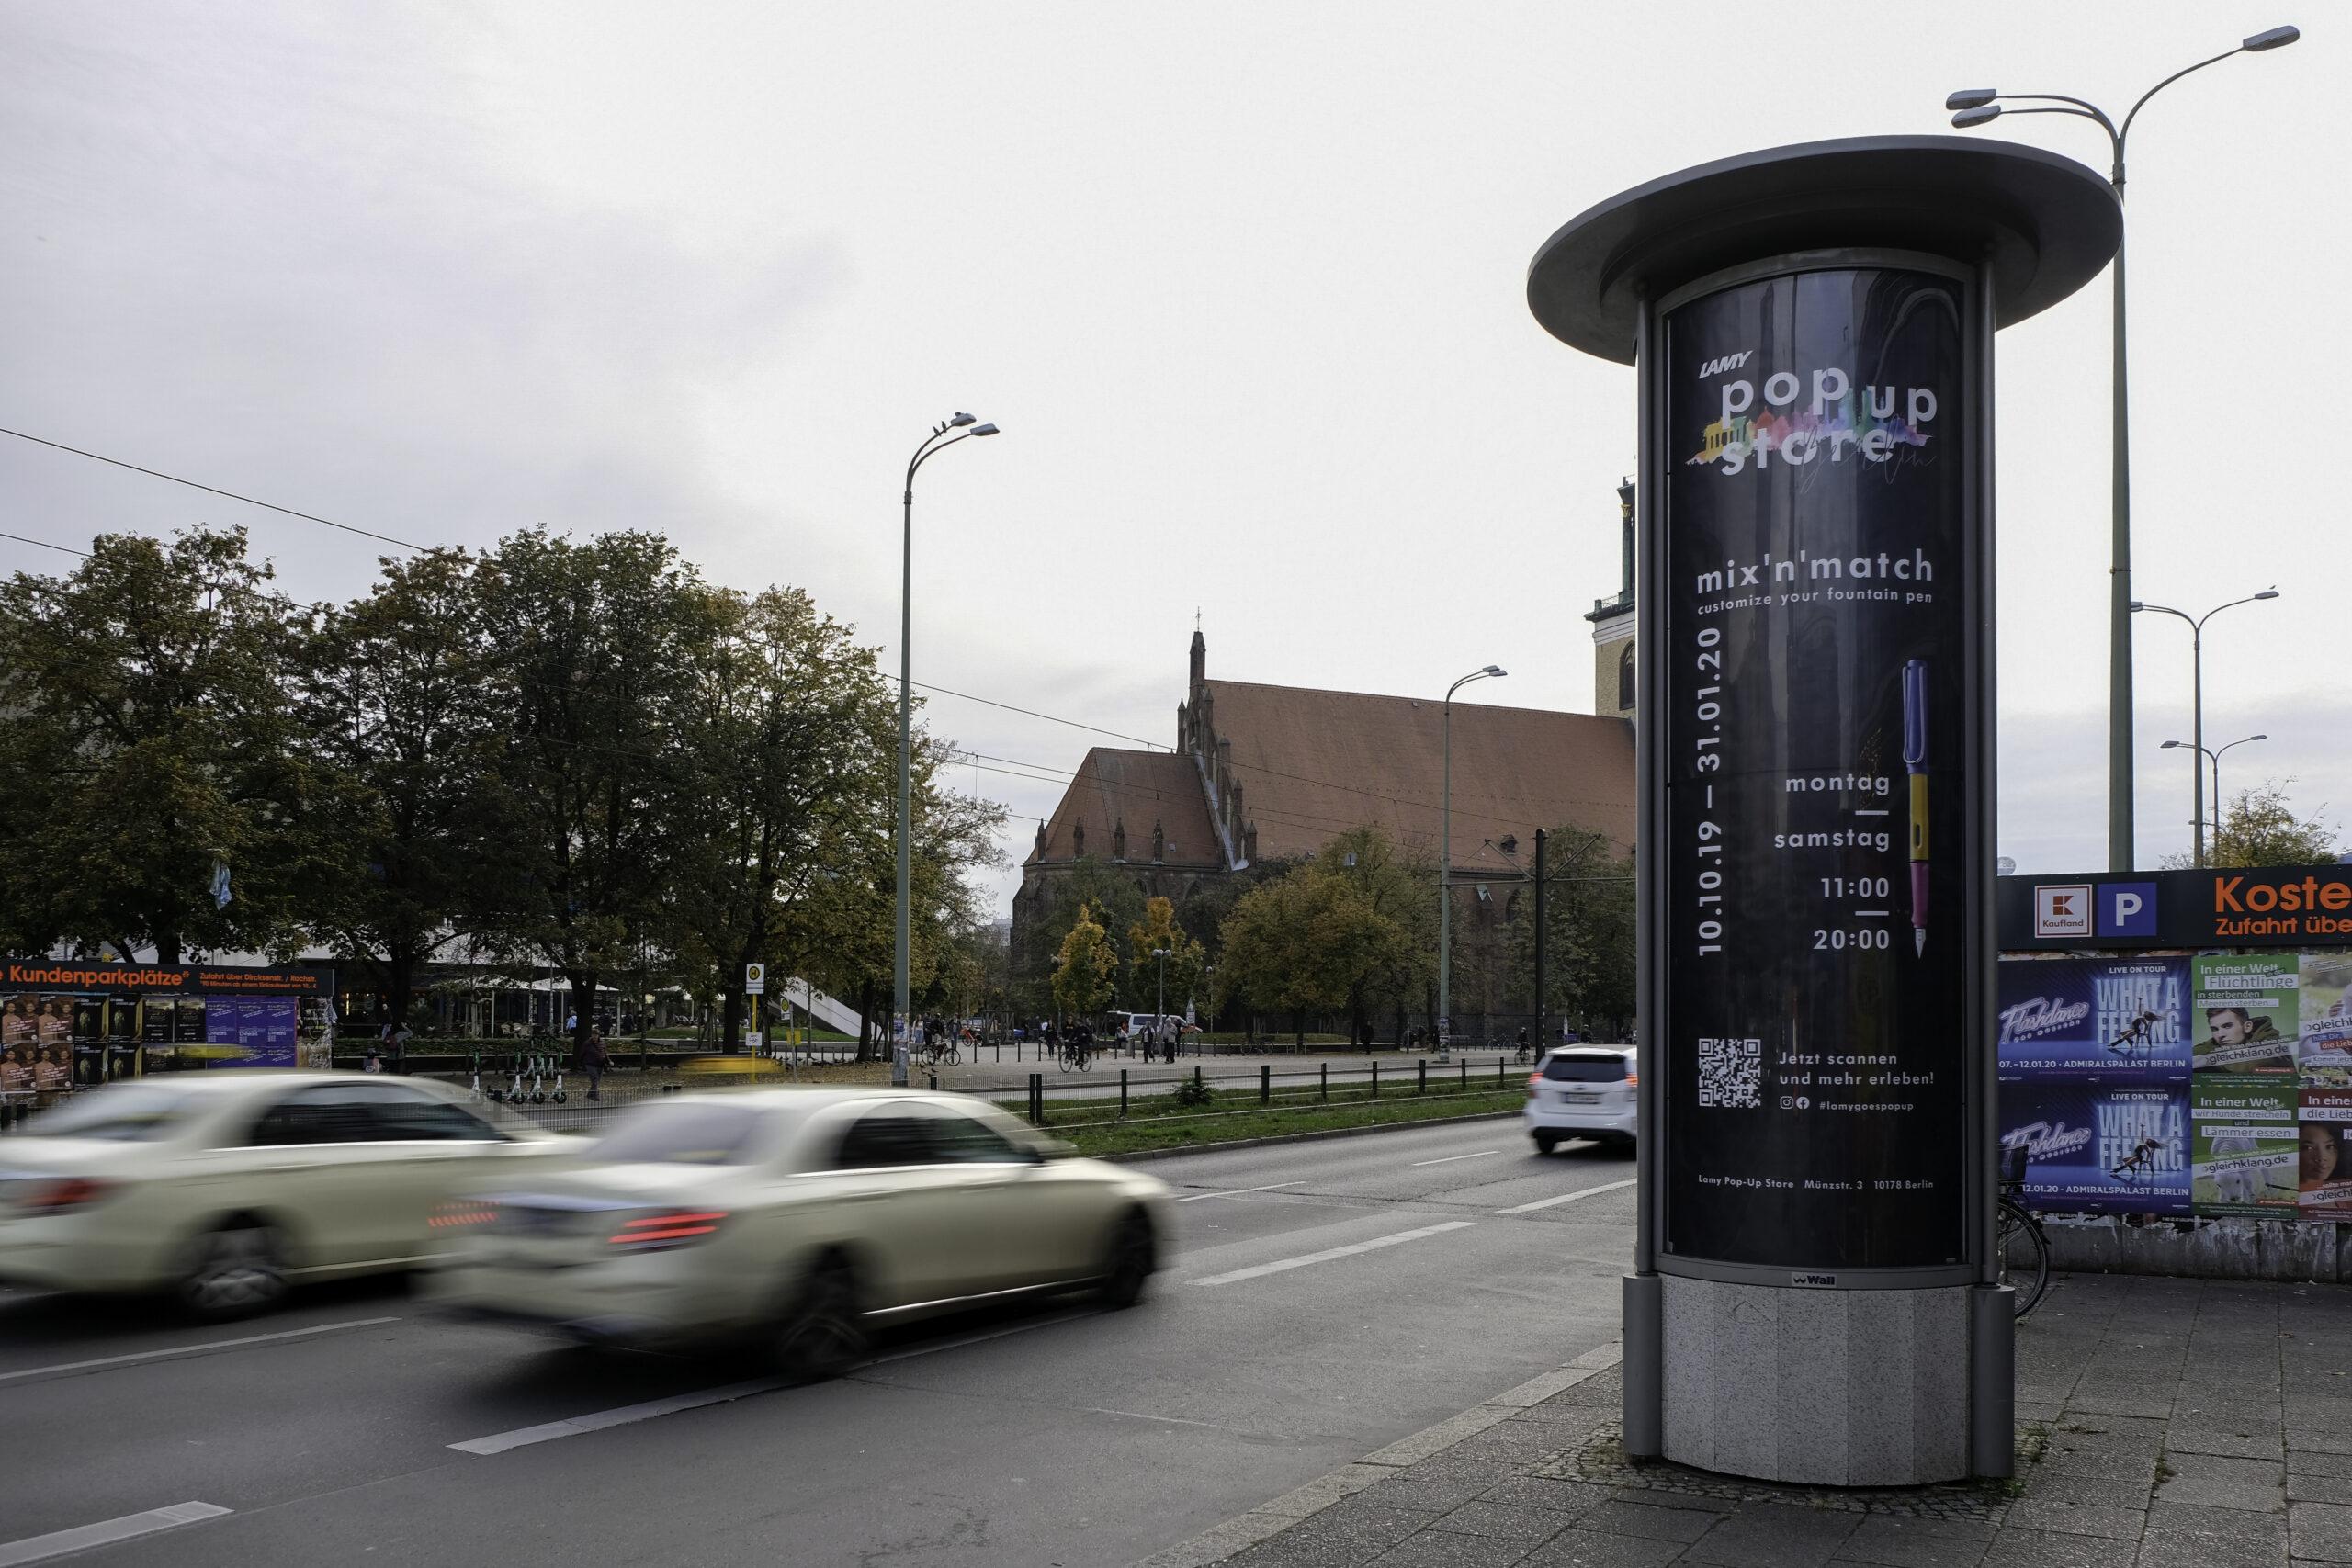 Buero-Uno_Experimential_Marketing_Pop-Up_Muenchen_Berlin_Project_Lamy_citylight_alexanderplatz